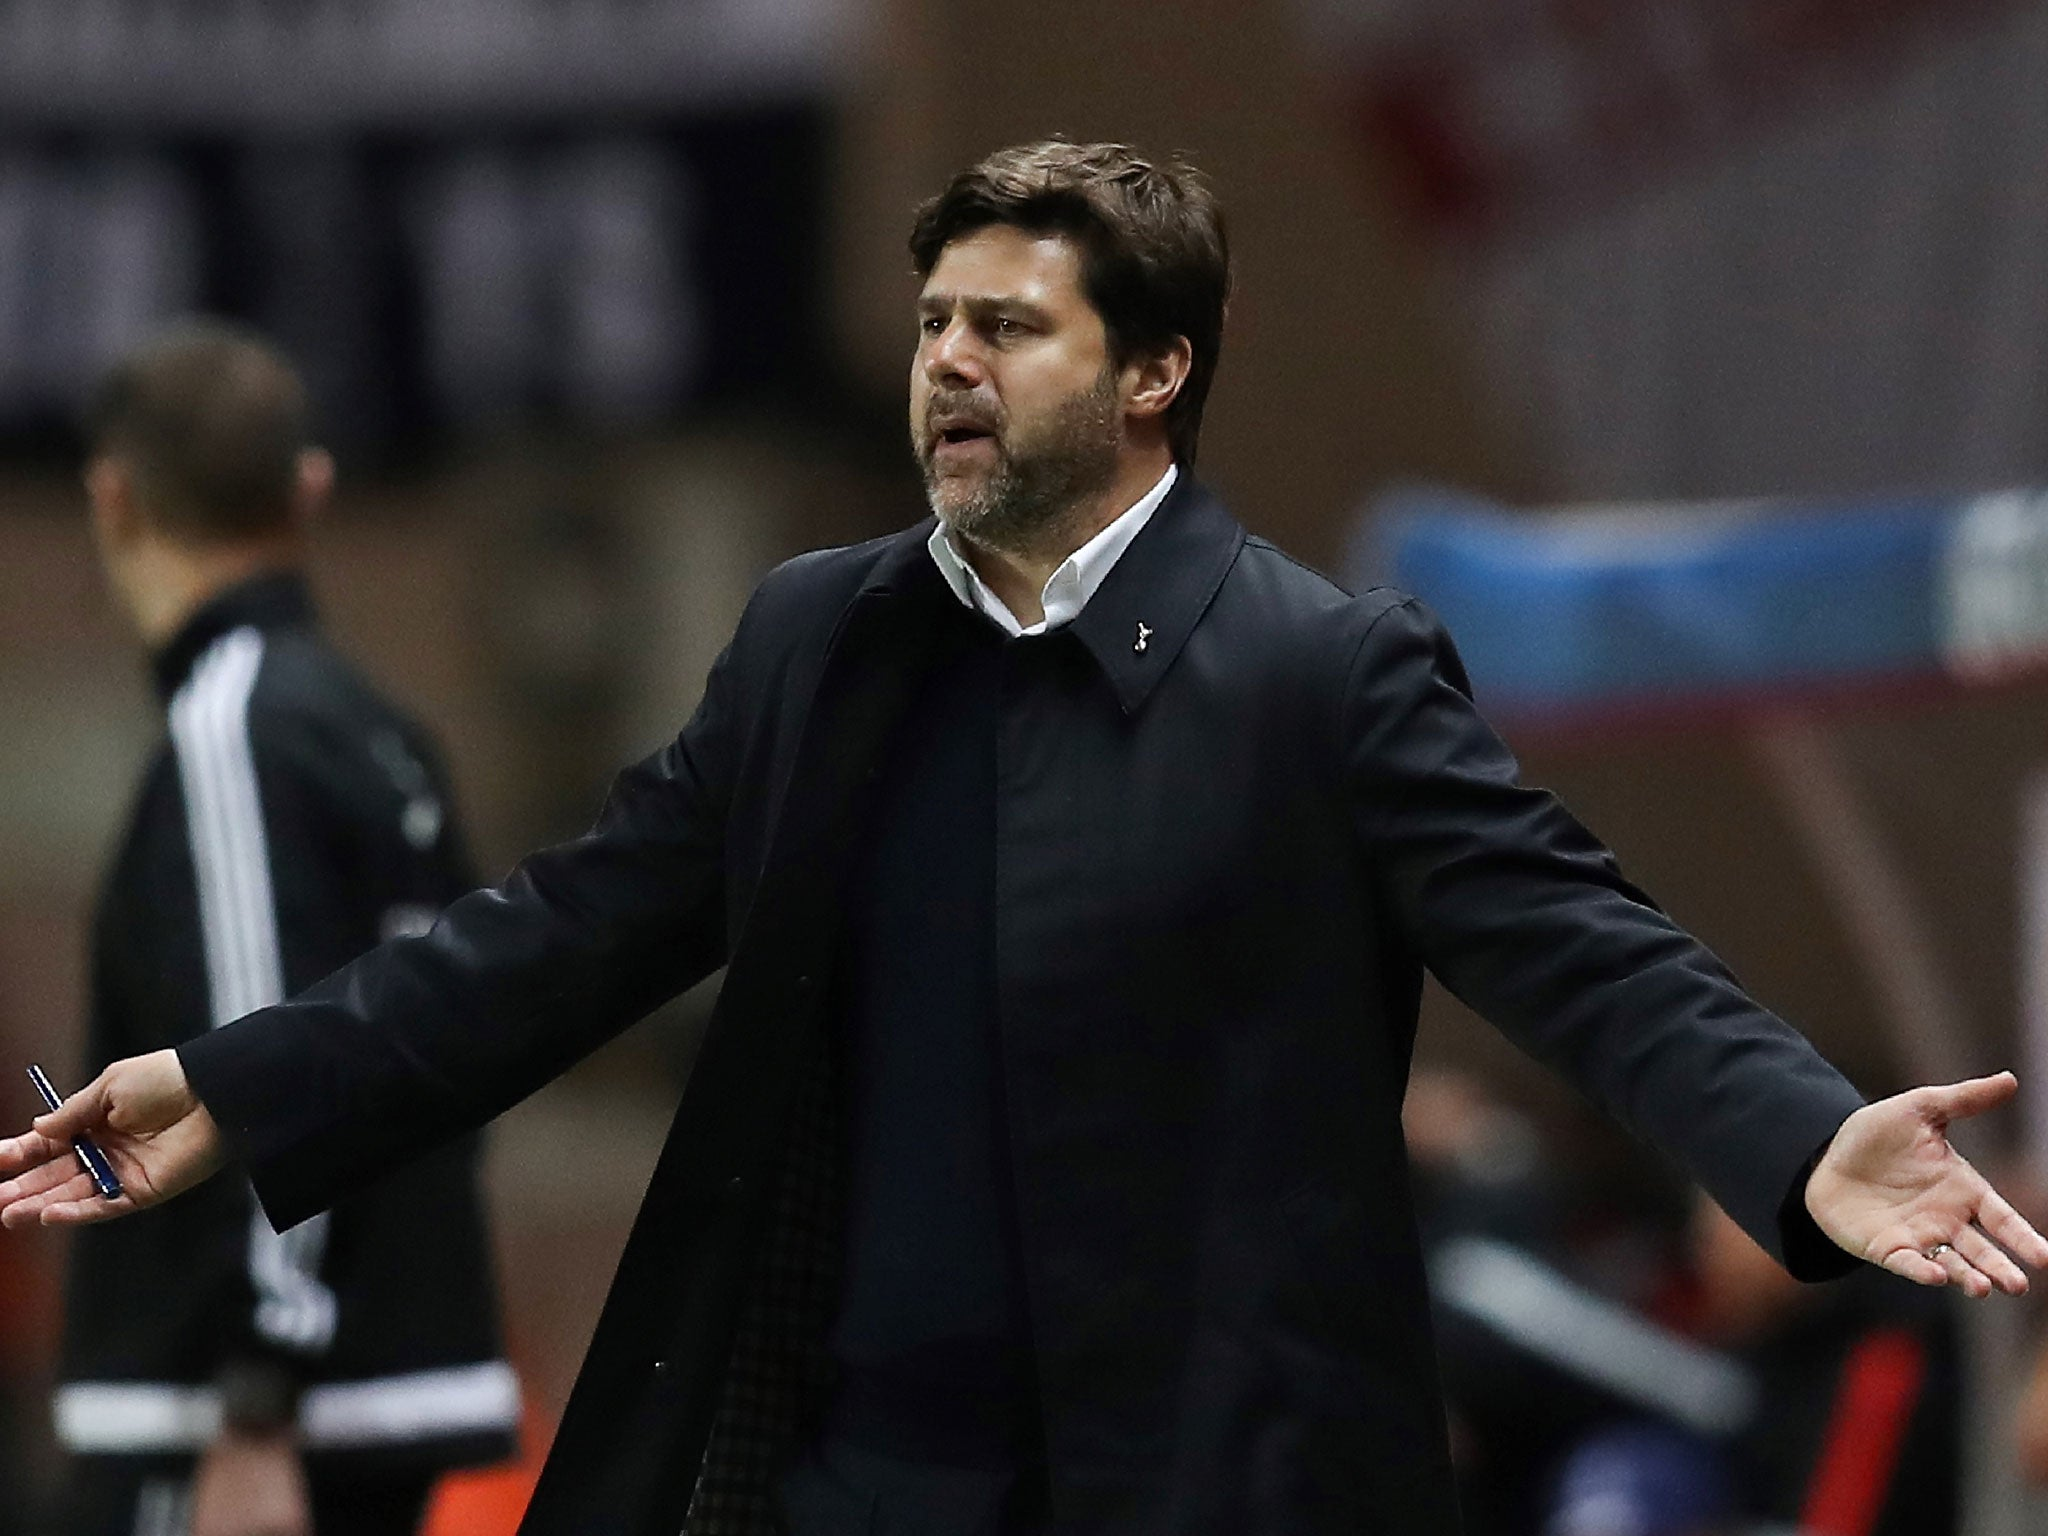 Monaco vs Tottenham: Mauricio Pochettino wants 'more quality' in Spurs squad after Champions League exit